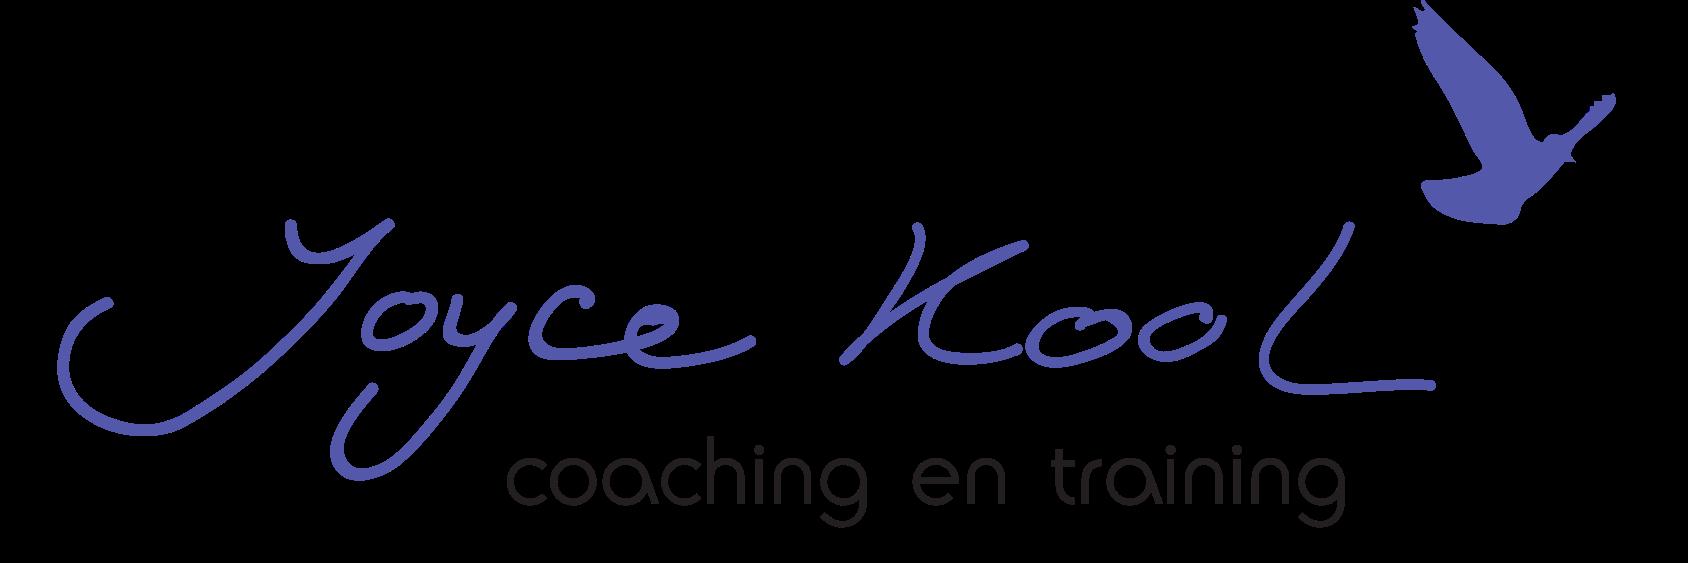 Joyce Kool